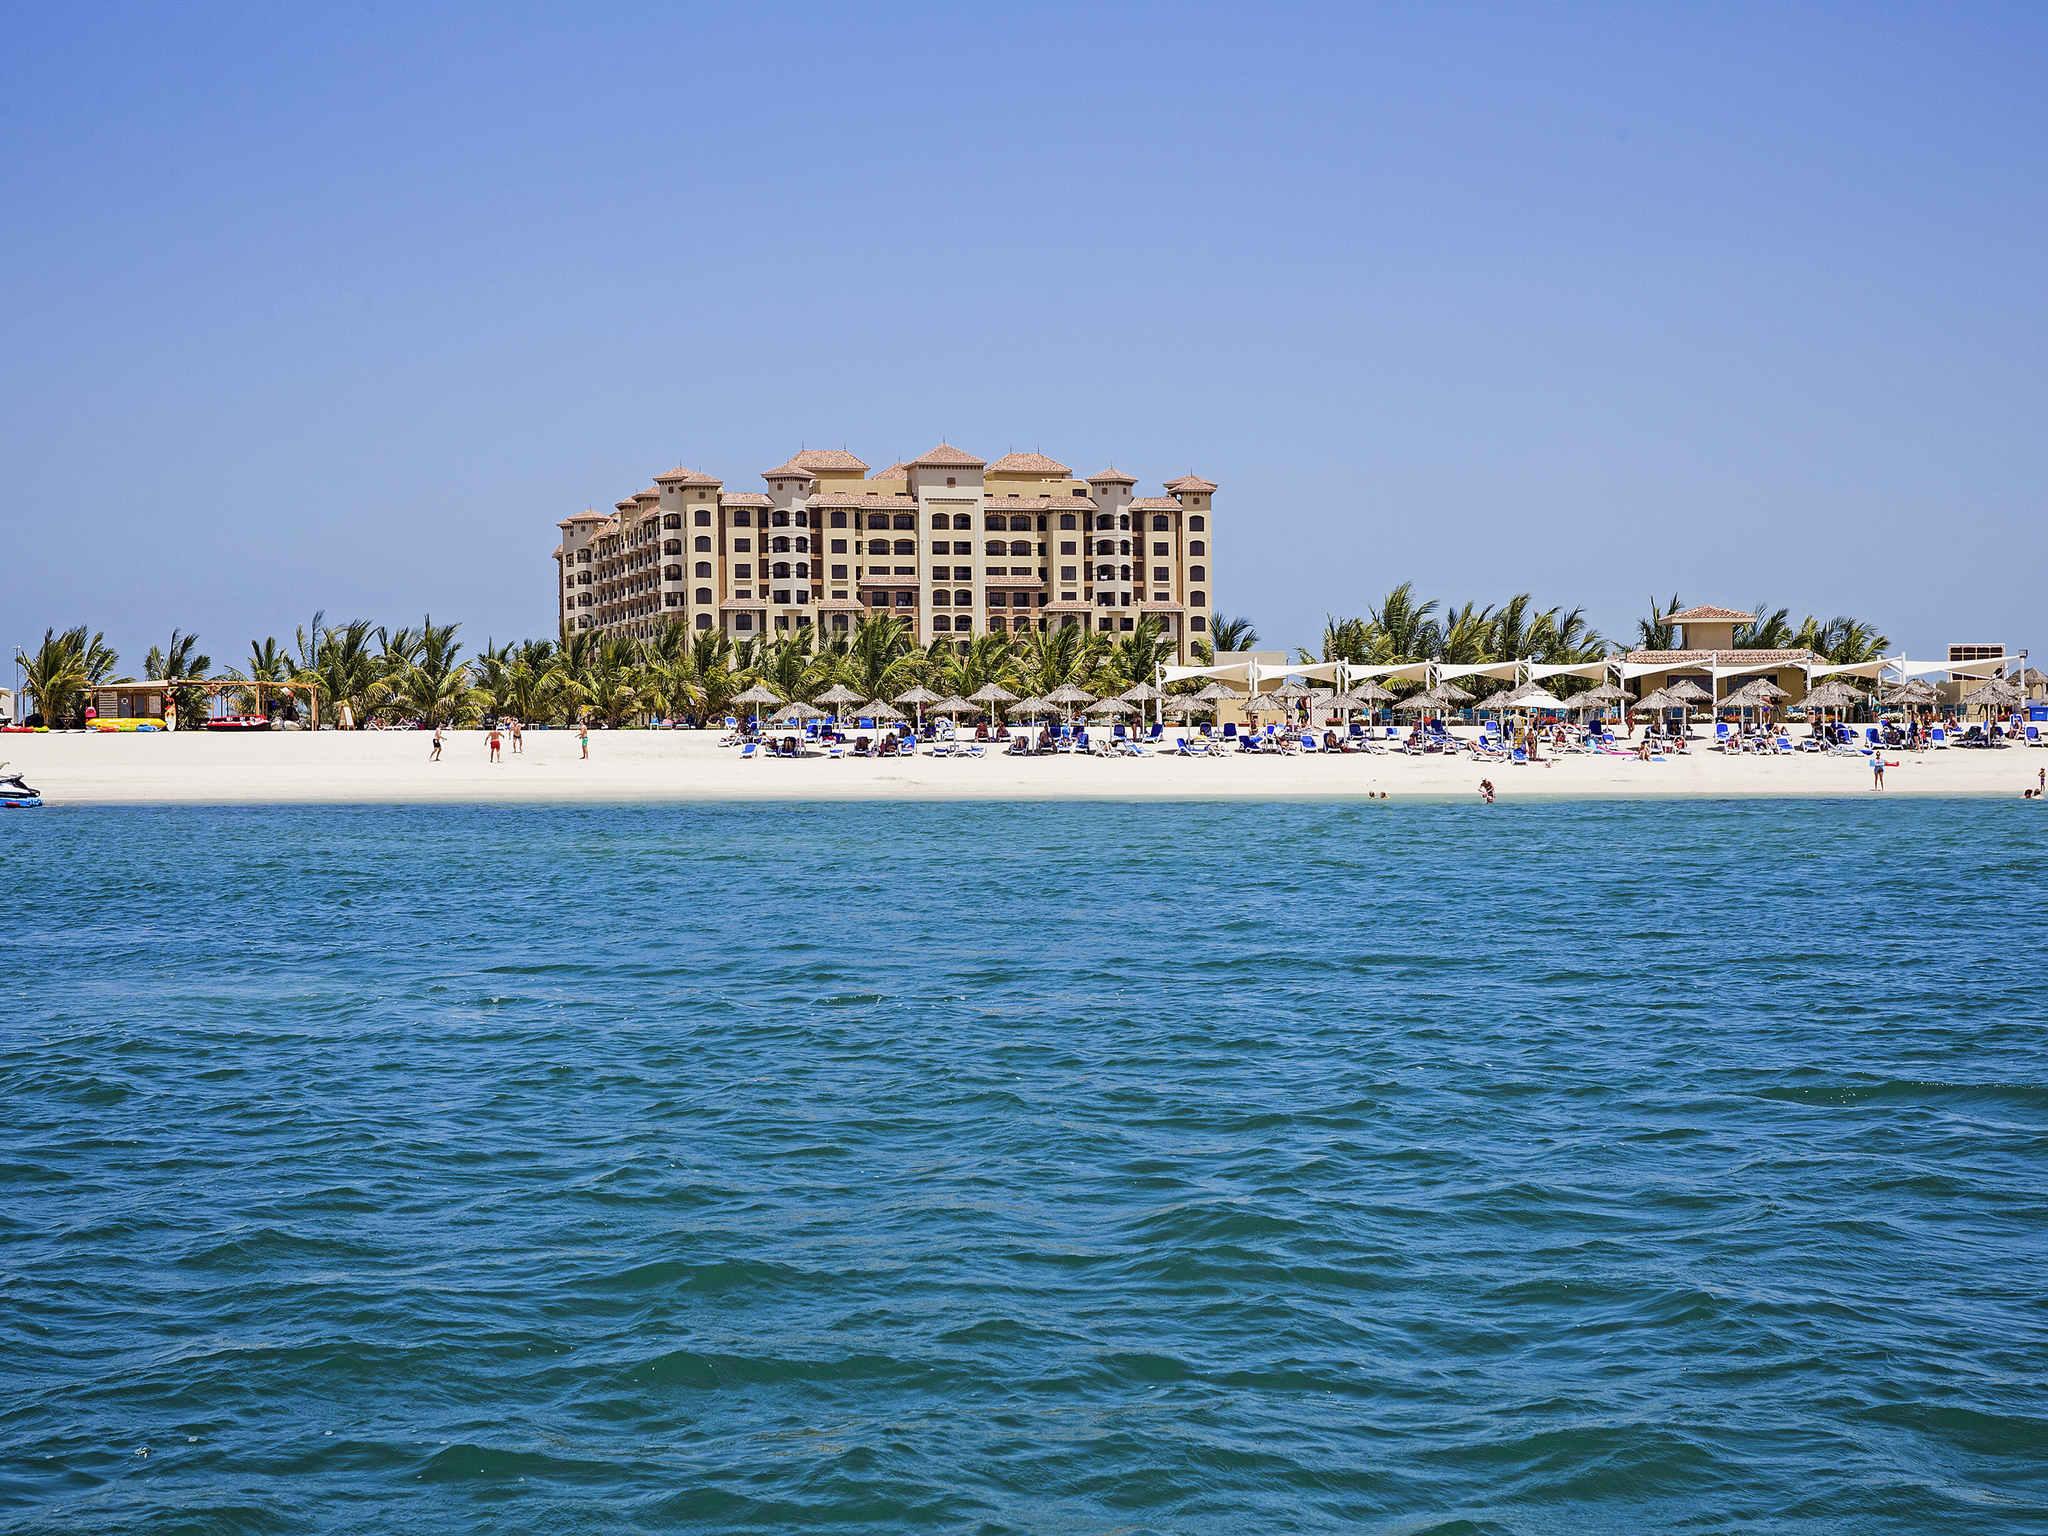 Hotel - Marjan Island Resort & Spa Managed by AccorHotels